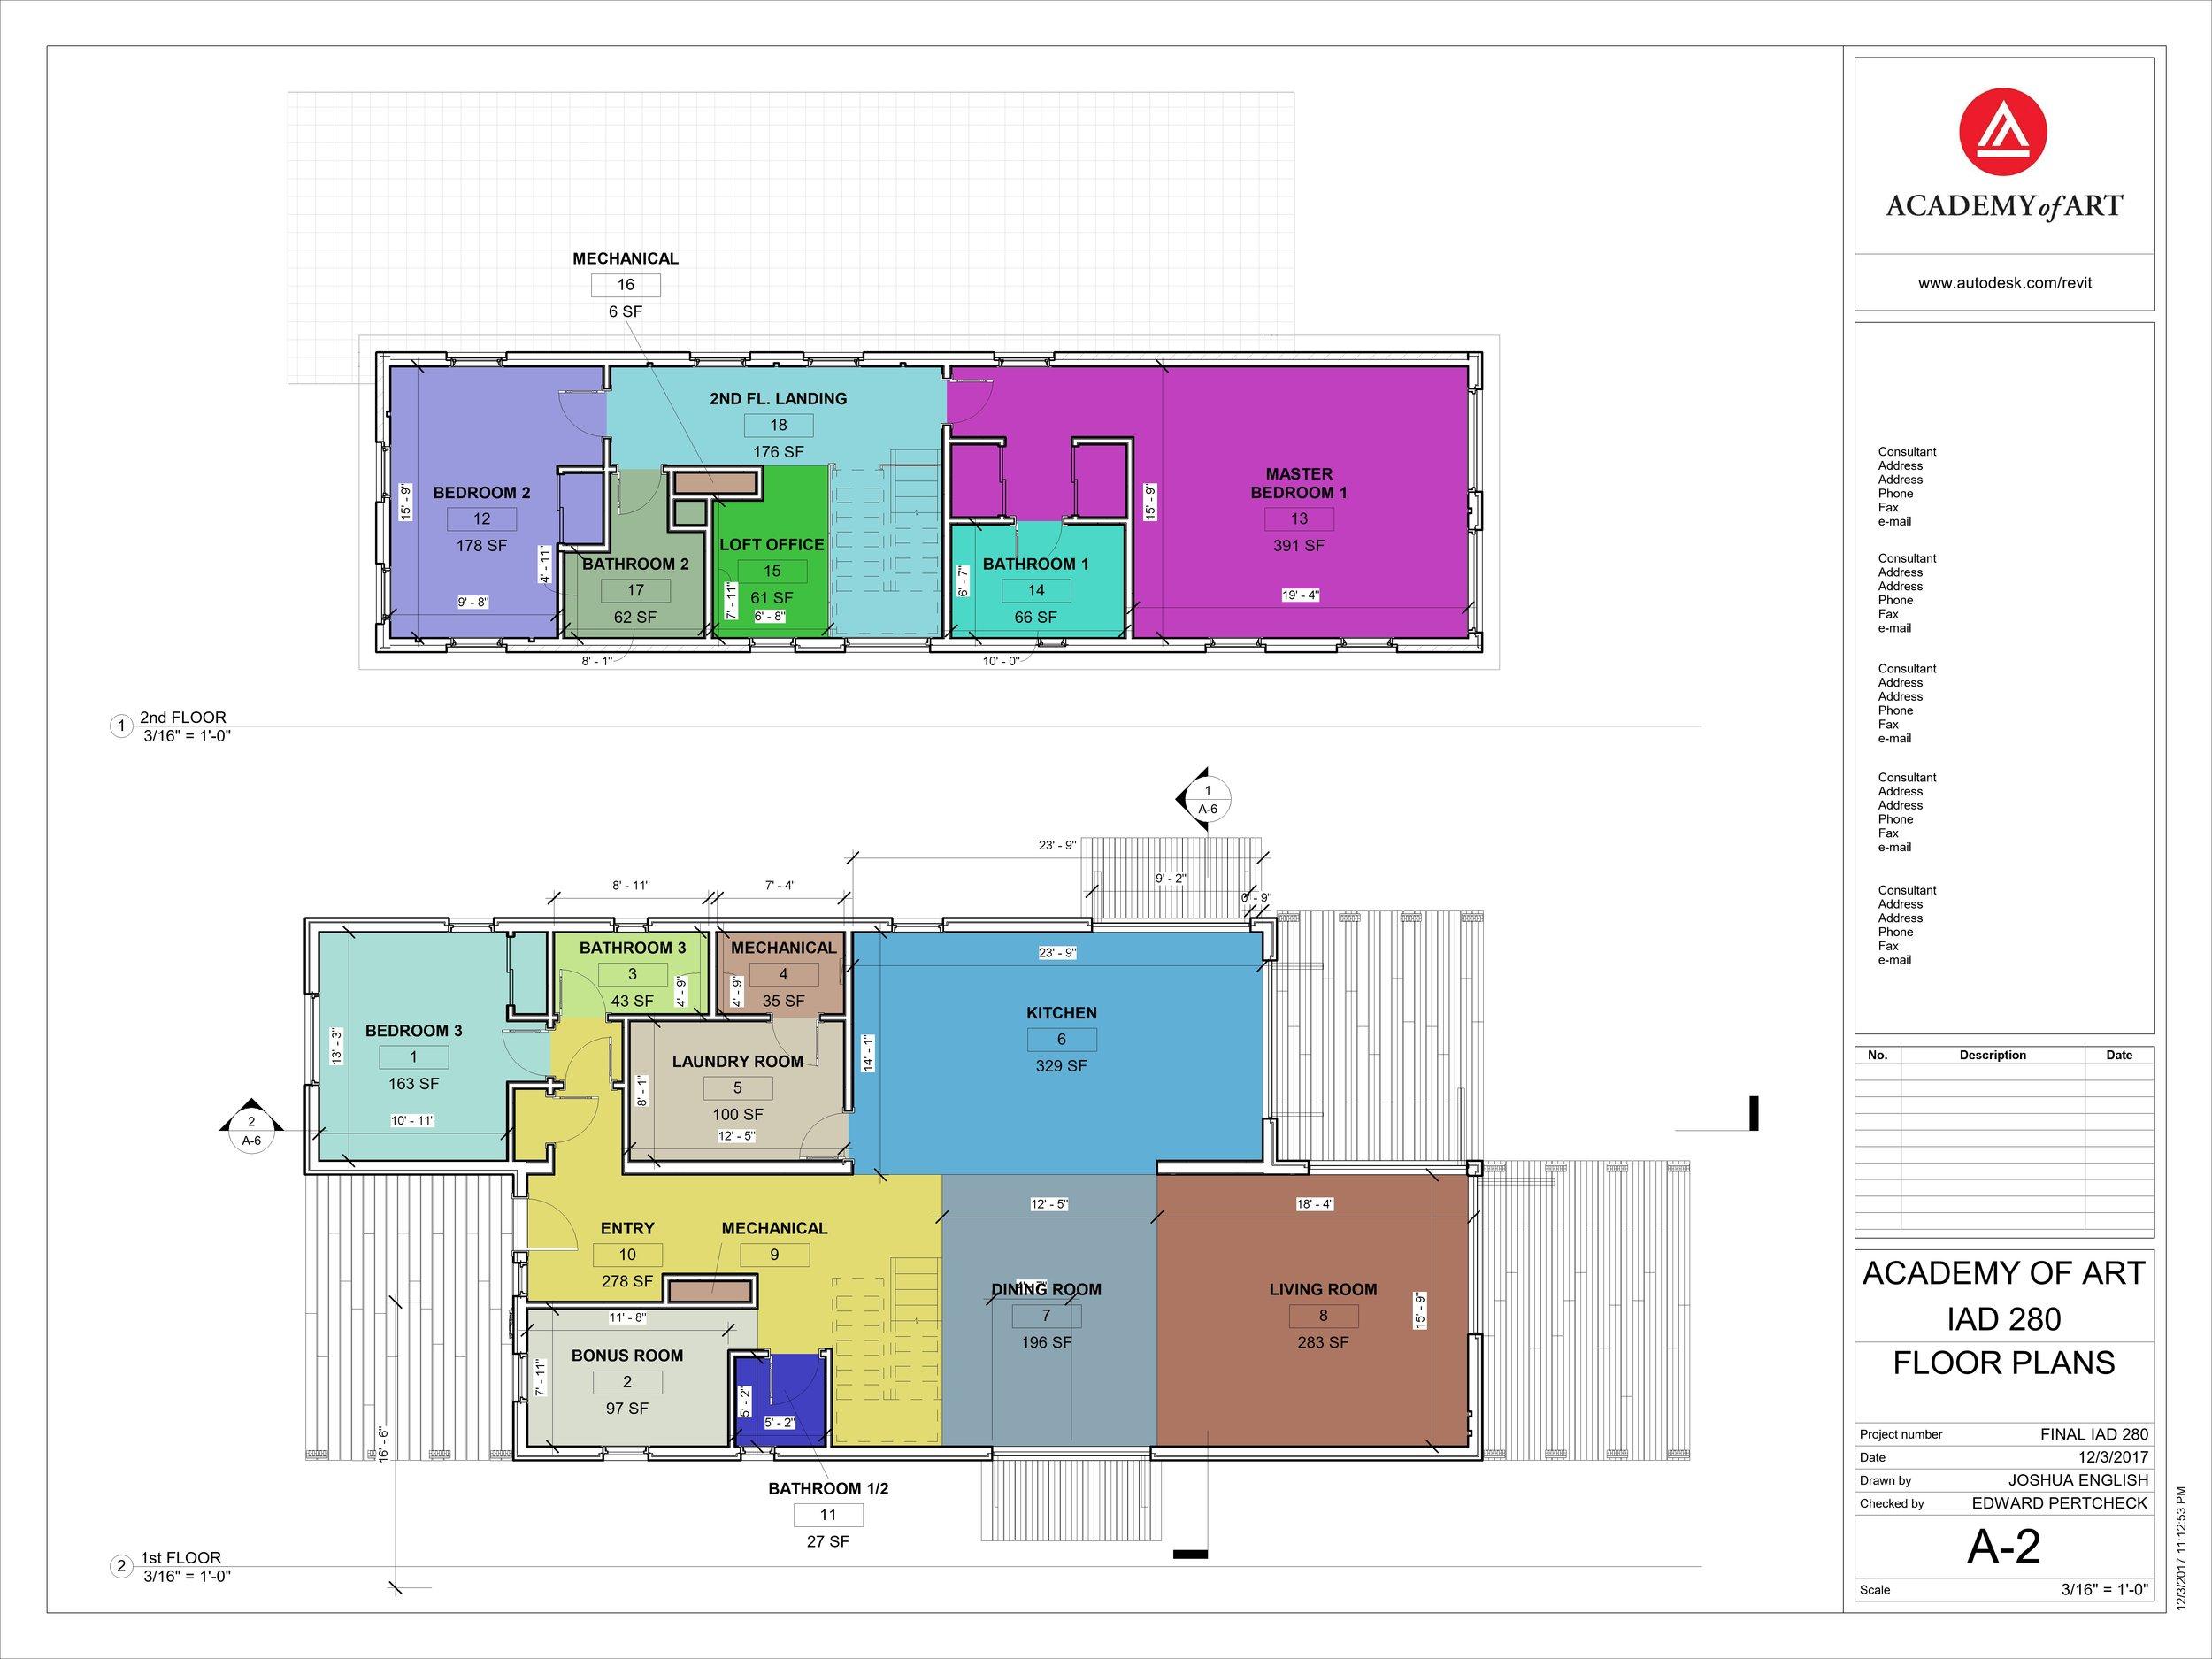 PP12 - Sheet - A-2 - FLOOR PLANS.jpg